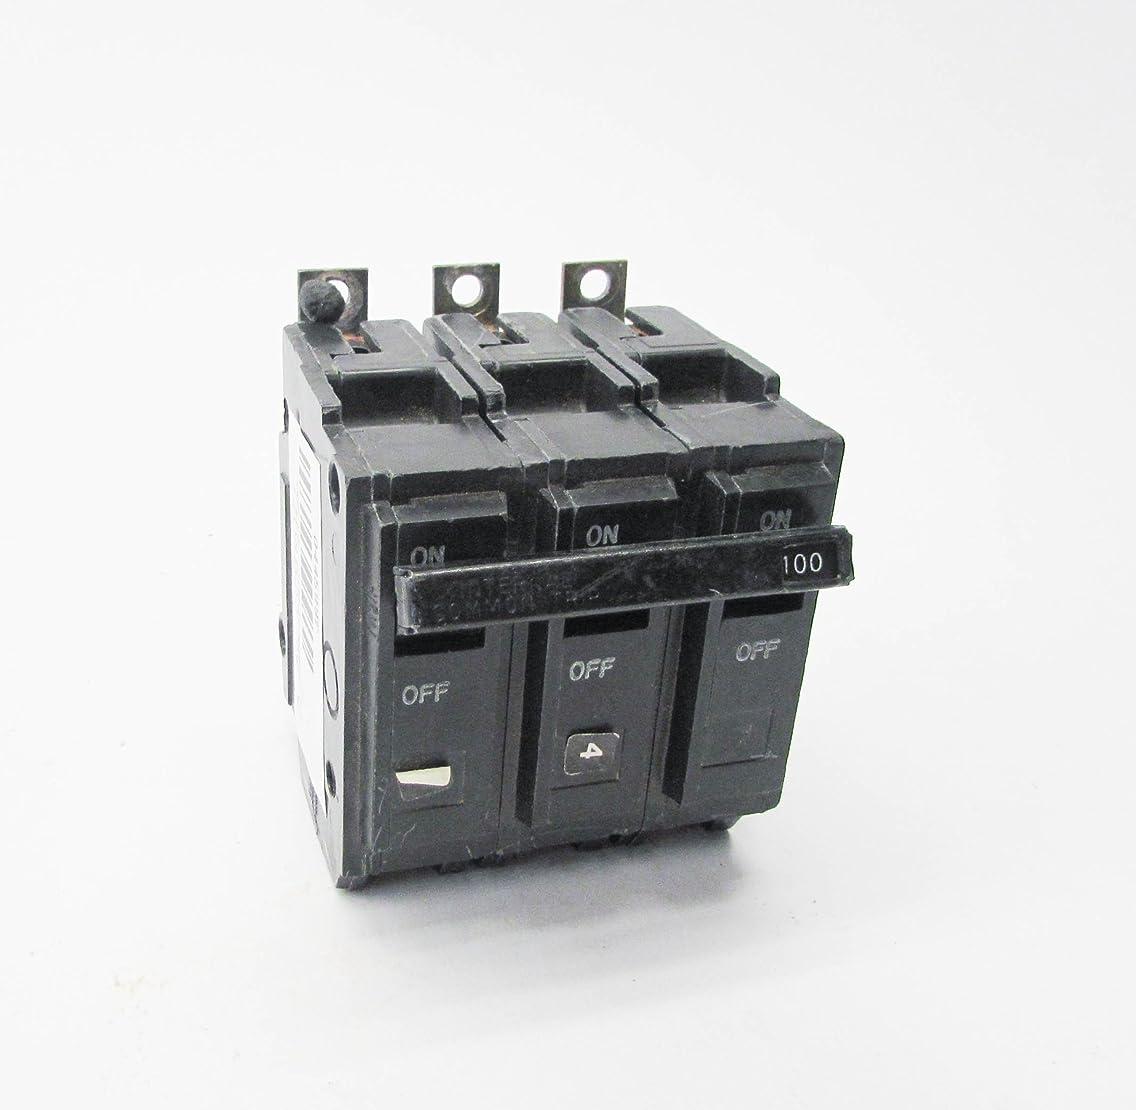 GE THQB32100 Bolt-On Mount Type THQB Miniature Circuit Breaker 3-Pole 100 Amp 240 Volt AC